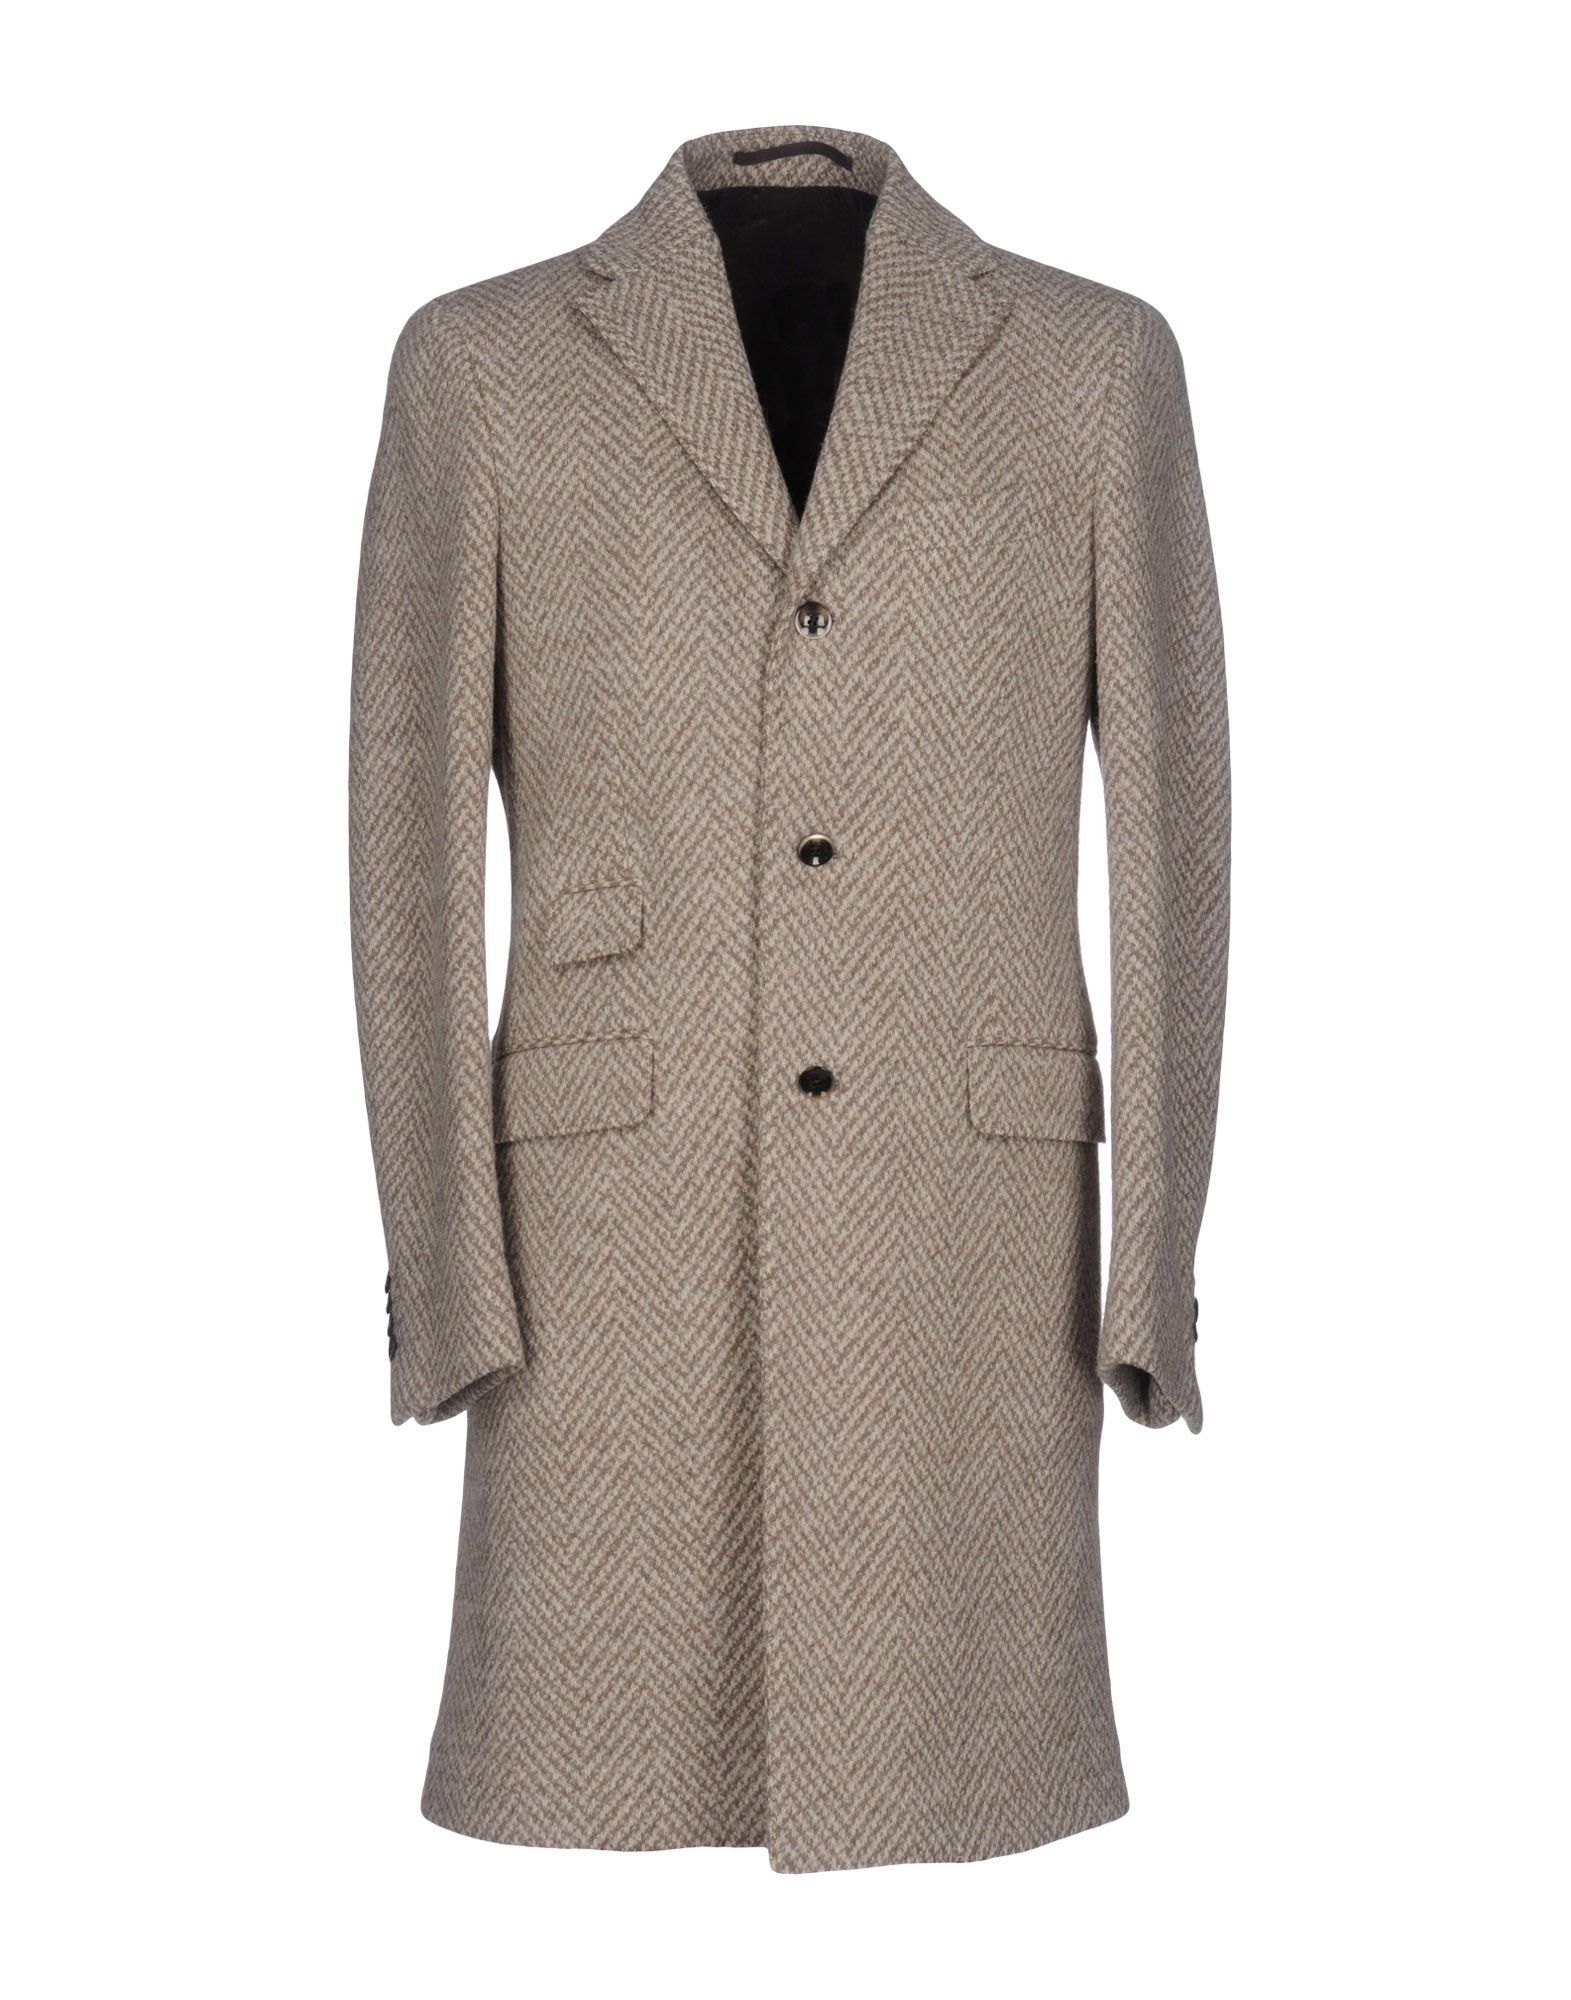 CANTARELLI JERSEY PLANET Пальто ac alessandro cantarelli джинсовая верхняя одежда